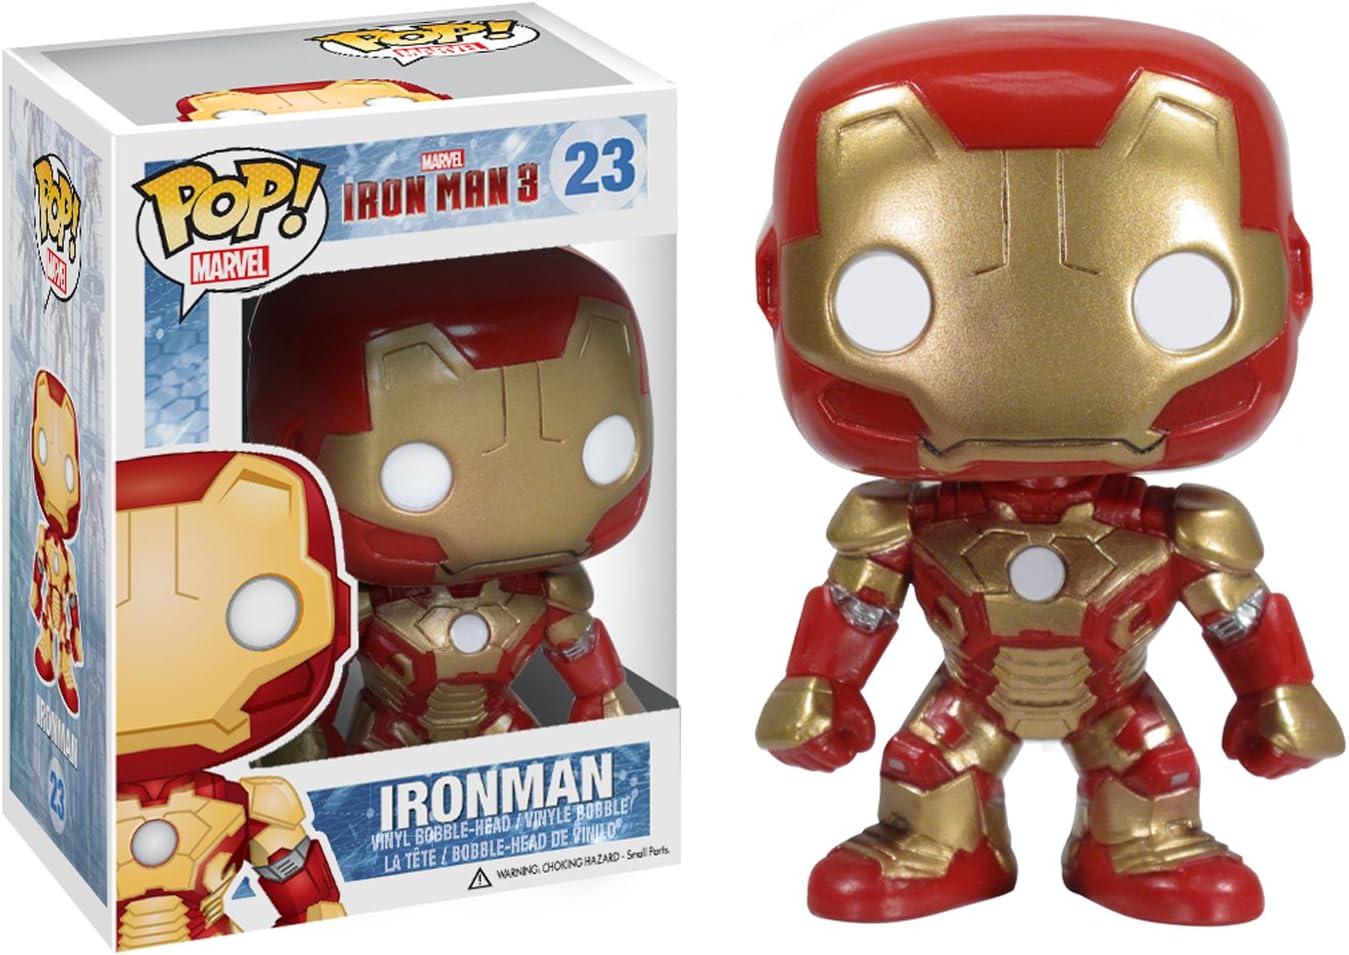 "Avengers Iron Man Light Up 3.75"" Bobble Head Action Figure"